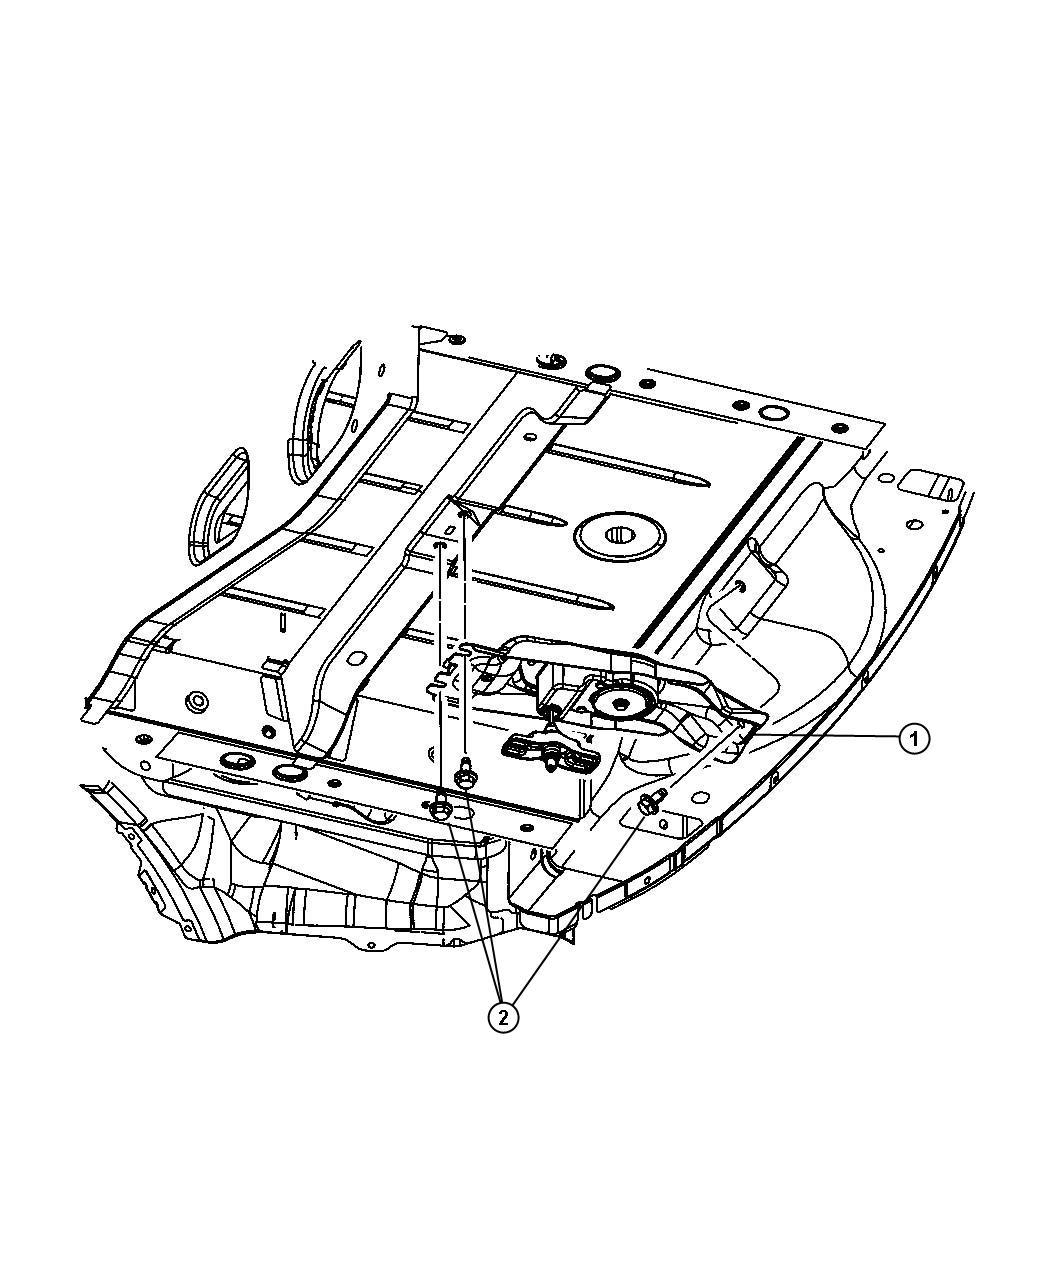 dodge dart body parts diagram  dodge  free engine image